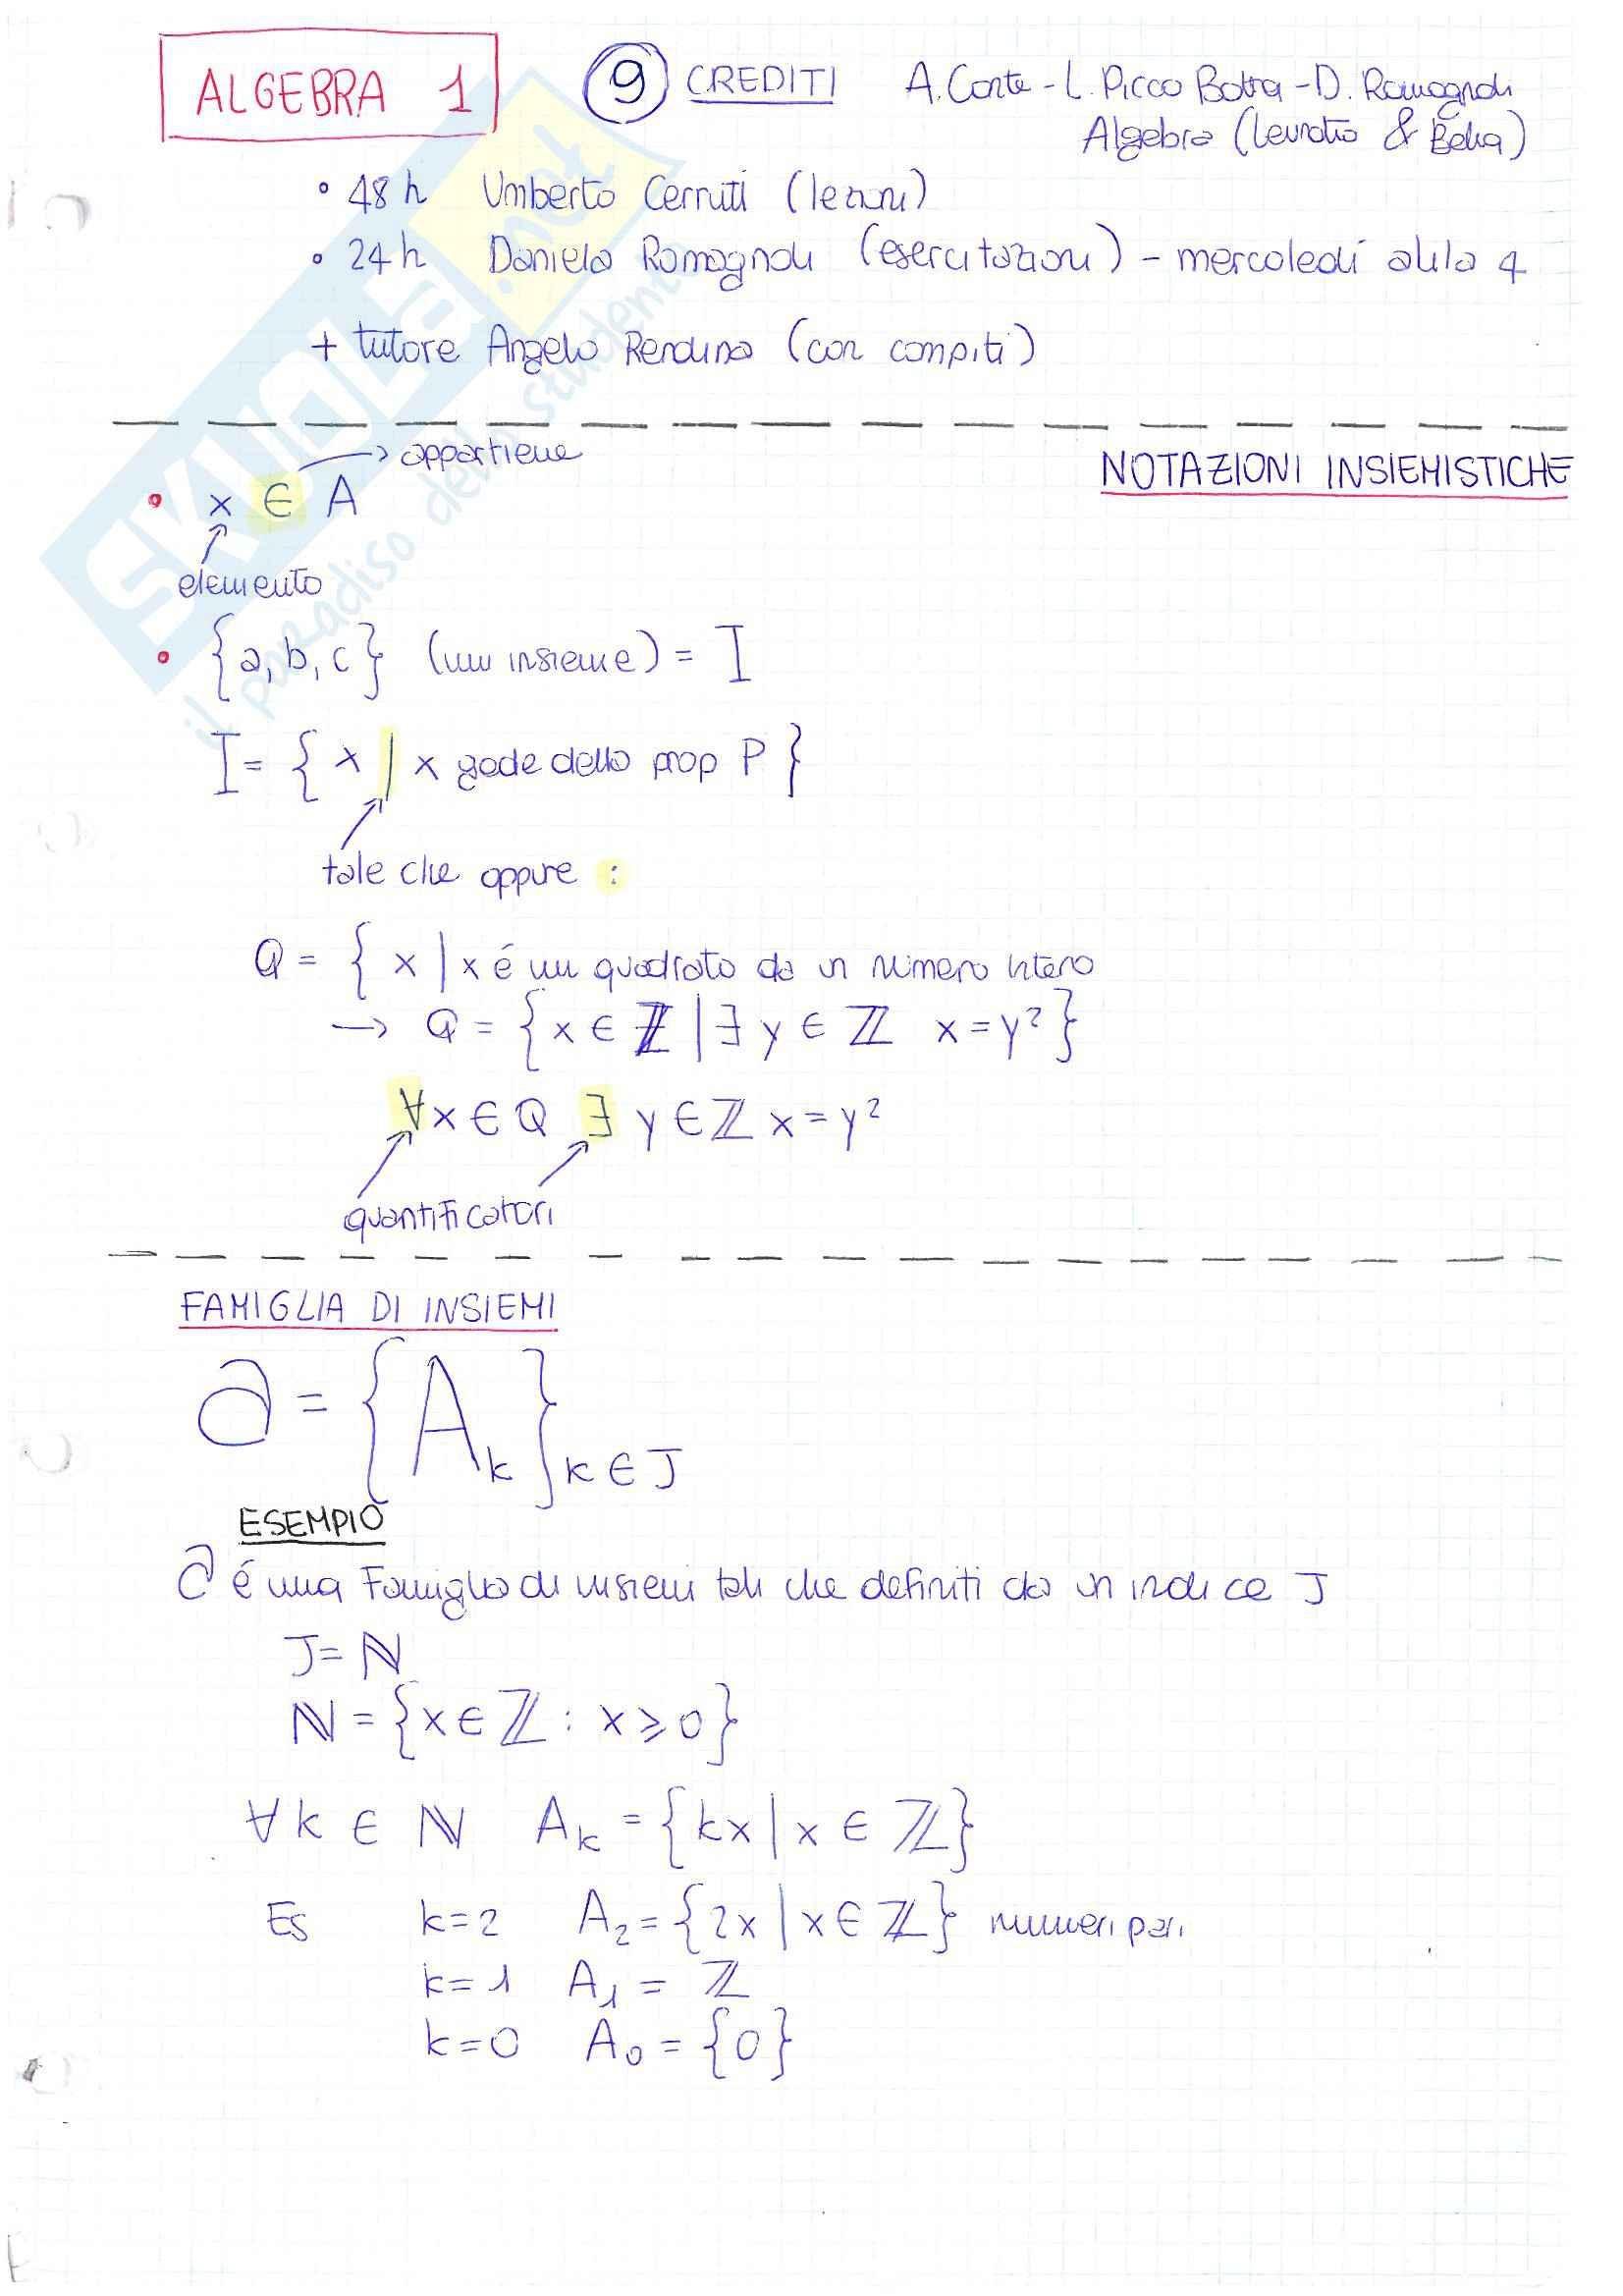 appunto U. Cerruti Algebra 1